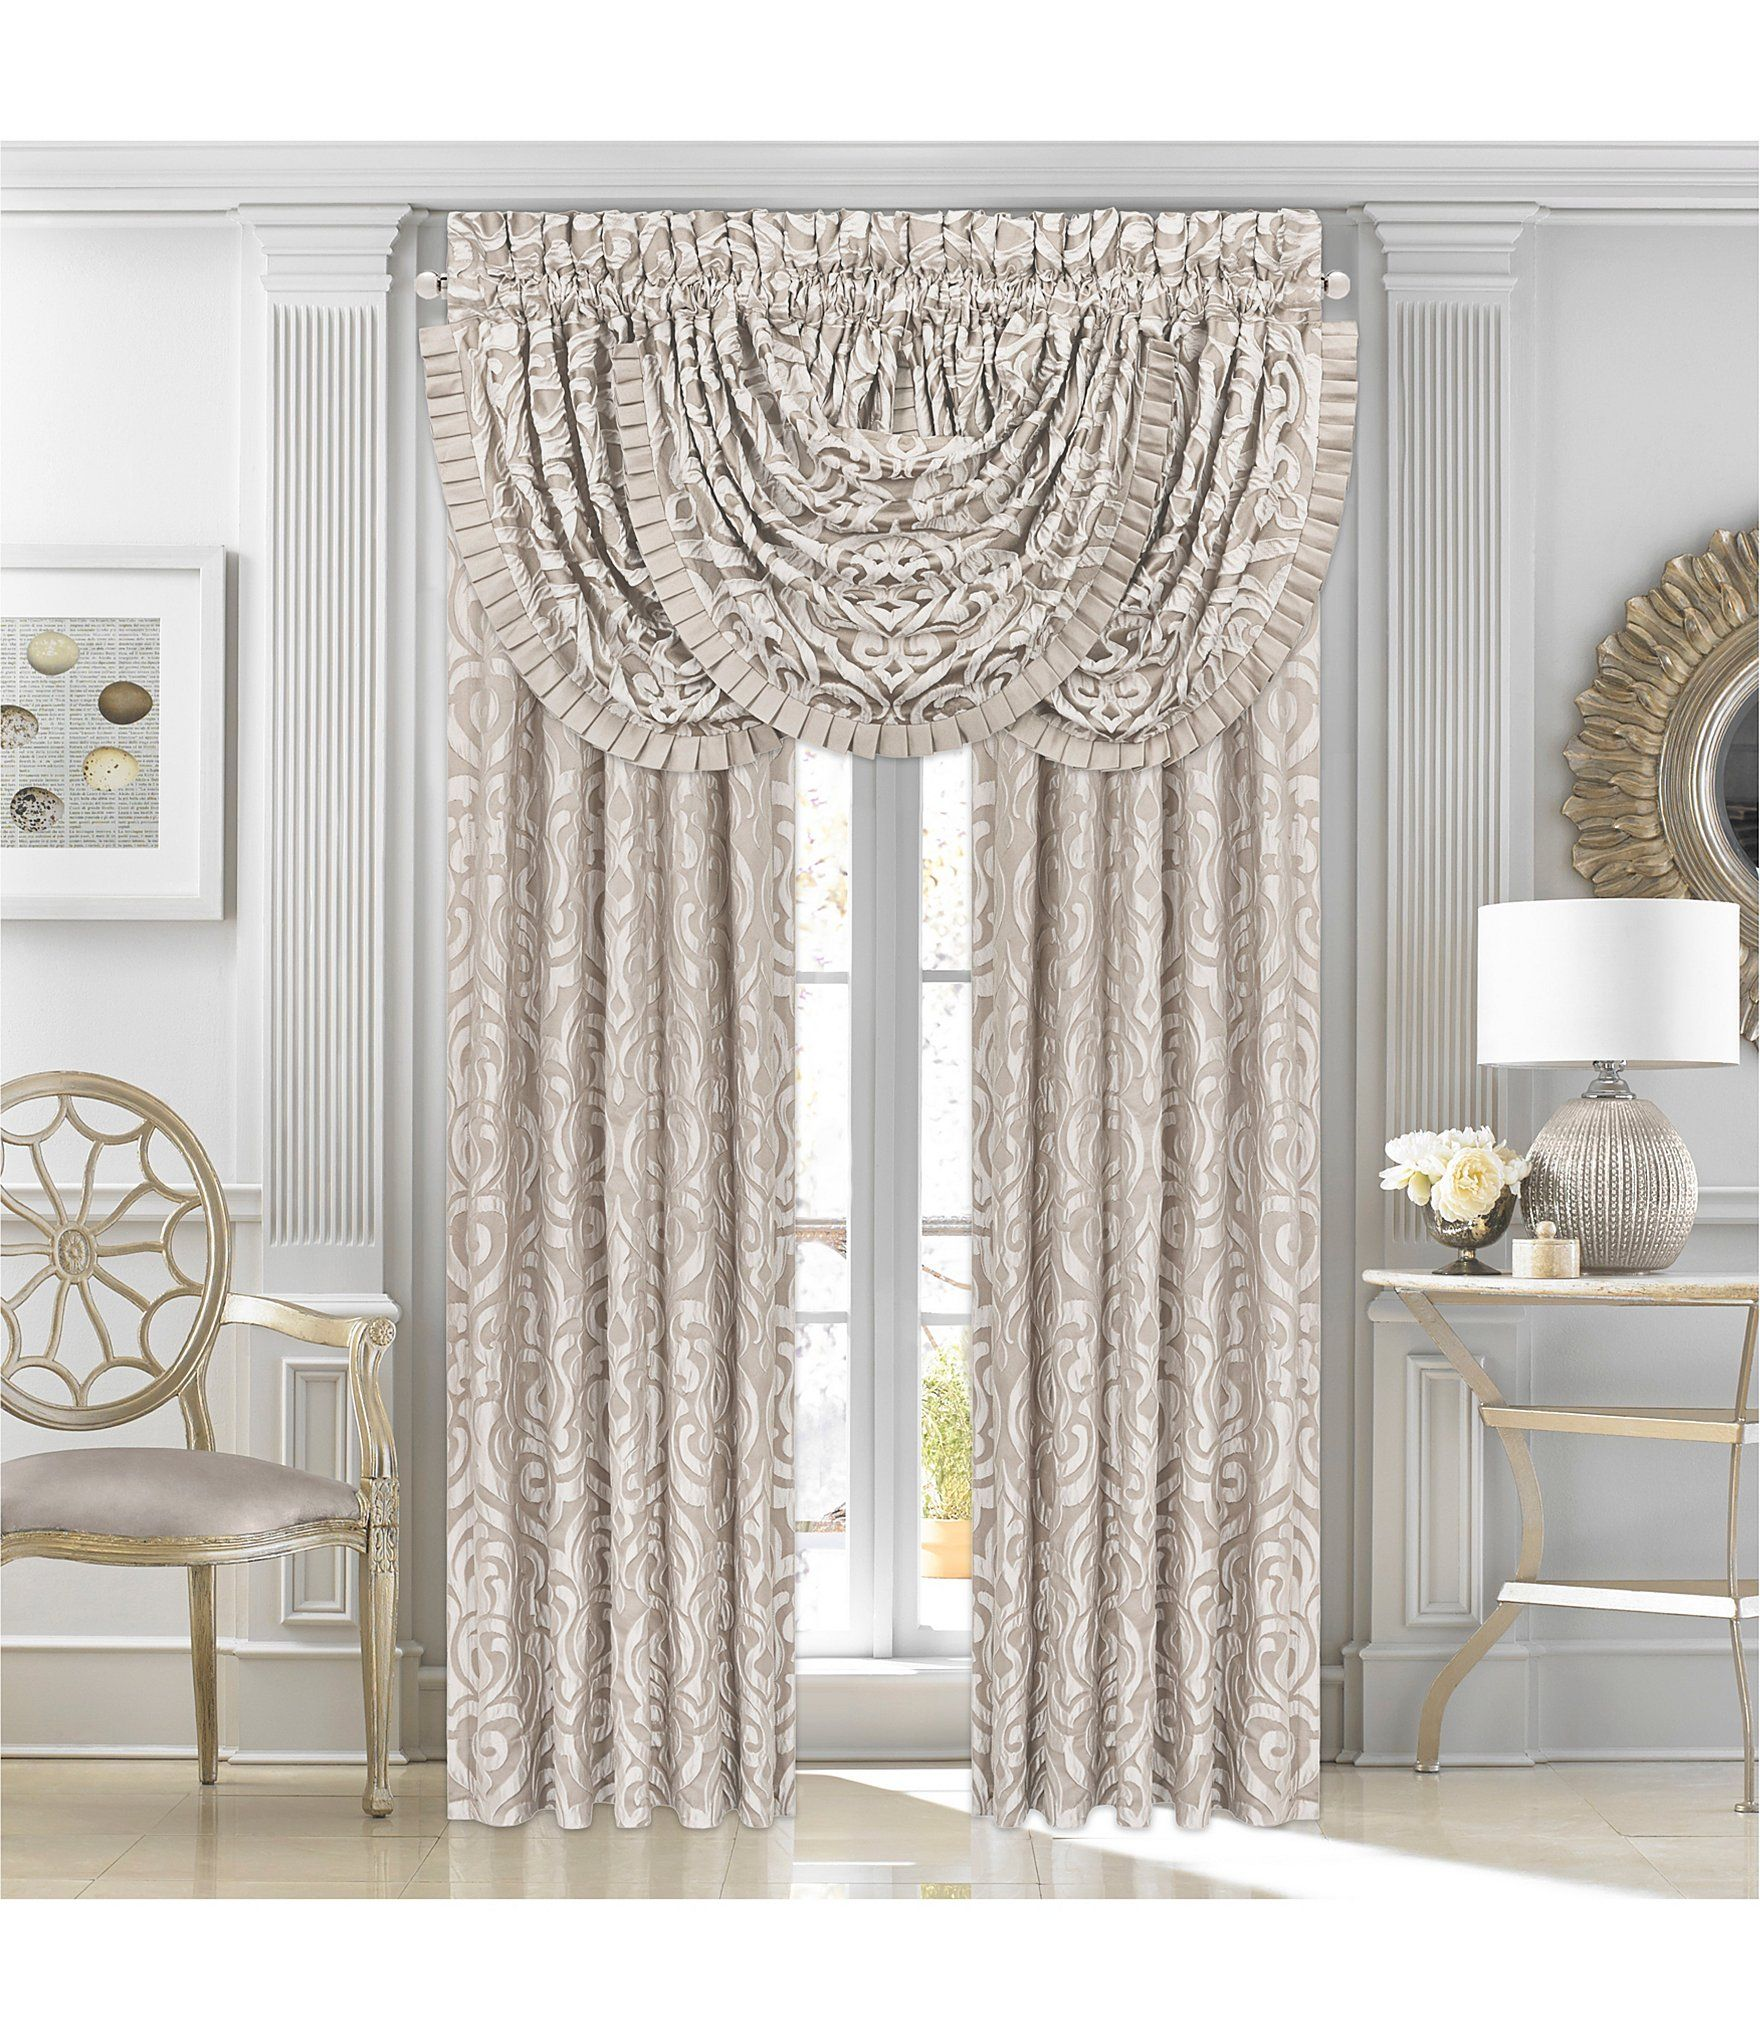 J Queen New York Astoria Sand Window Treatments Dillard S Queens New York J Queen New York Lined Curtains